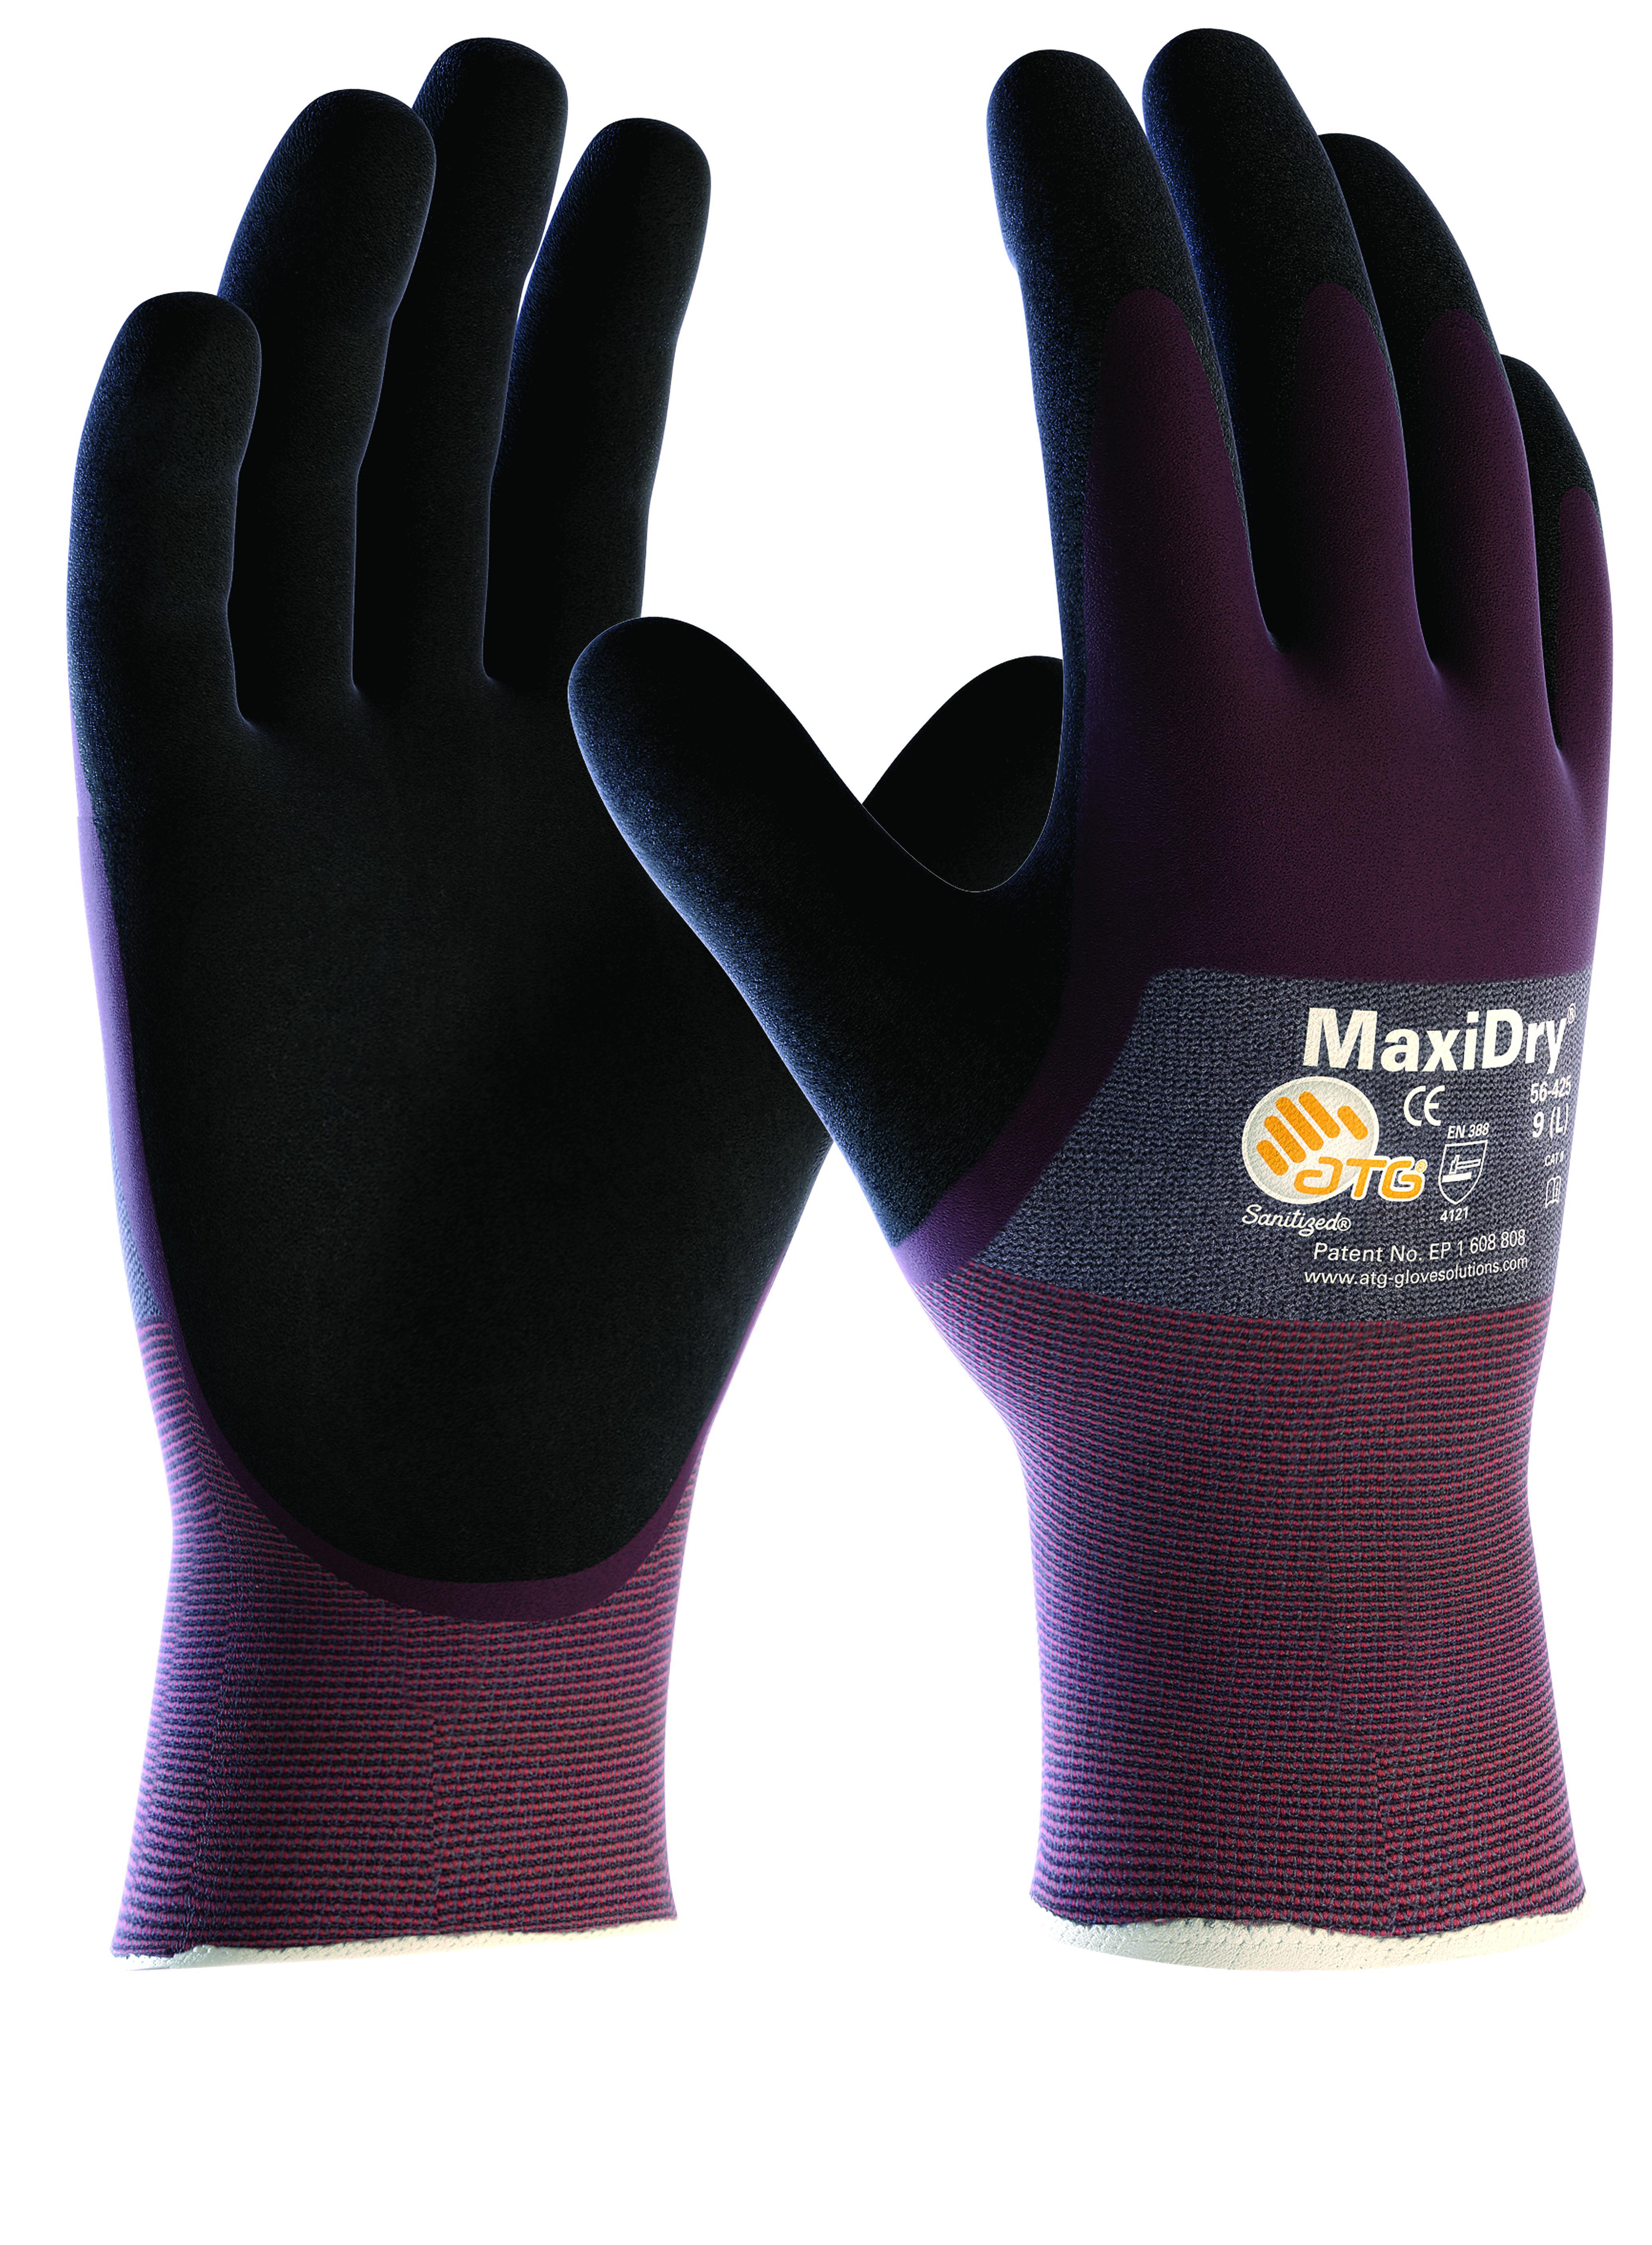 Maxidry Gp Oil Resistant Precison Handling Gloves Ref 56-425